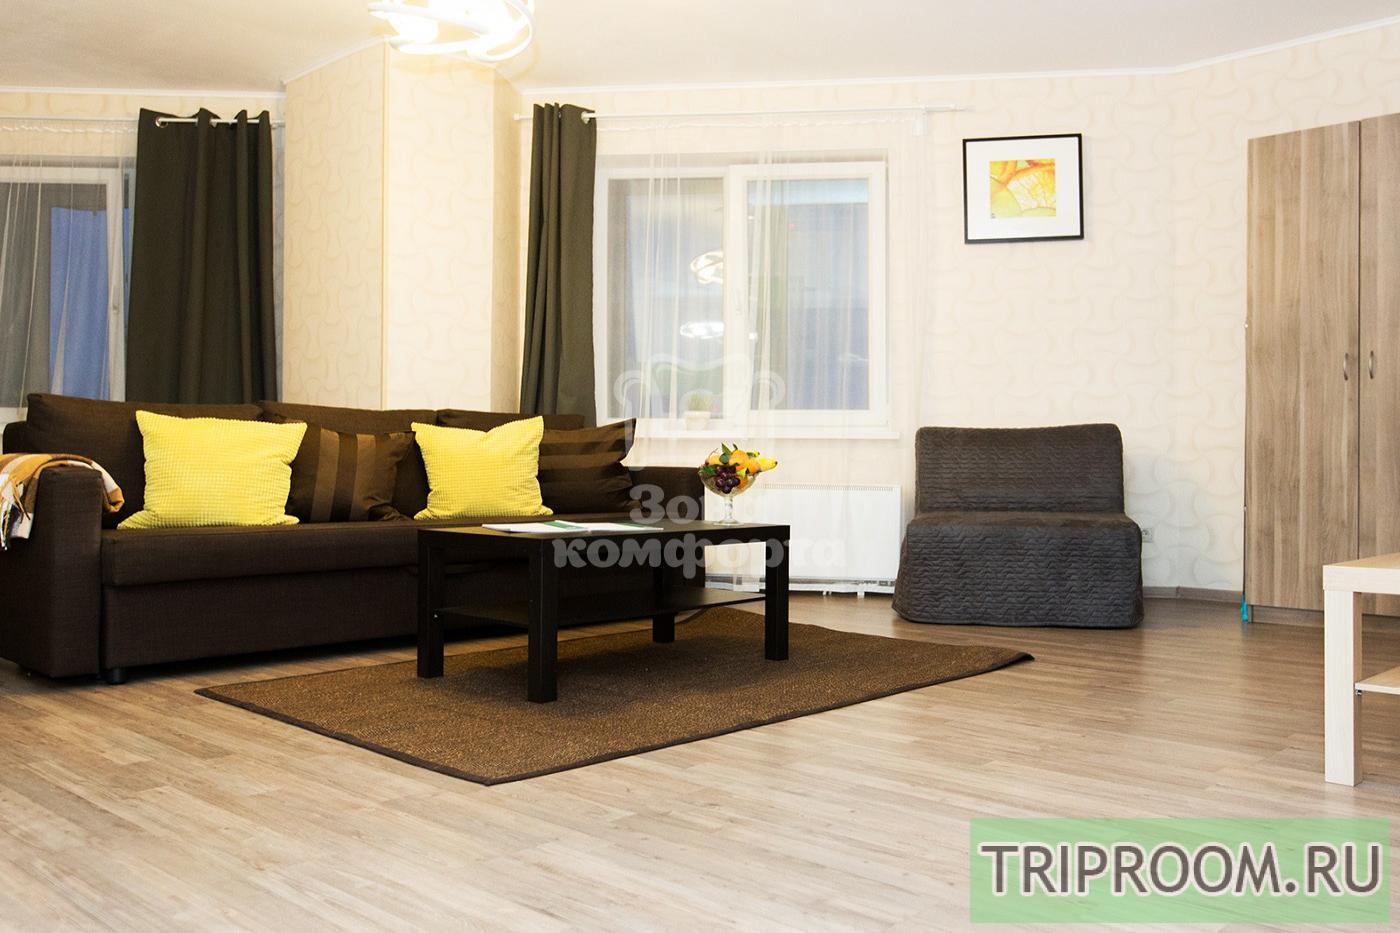 2-комнатная квартира посуточно (вариант № 34715), ул. Гагарина бульвар, фото № 23